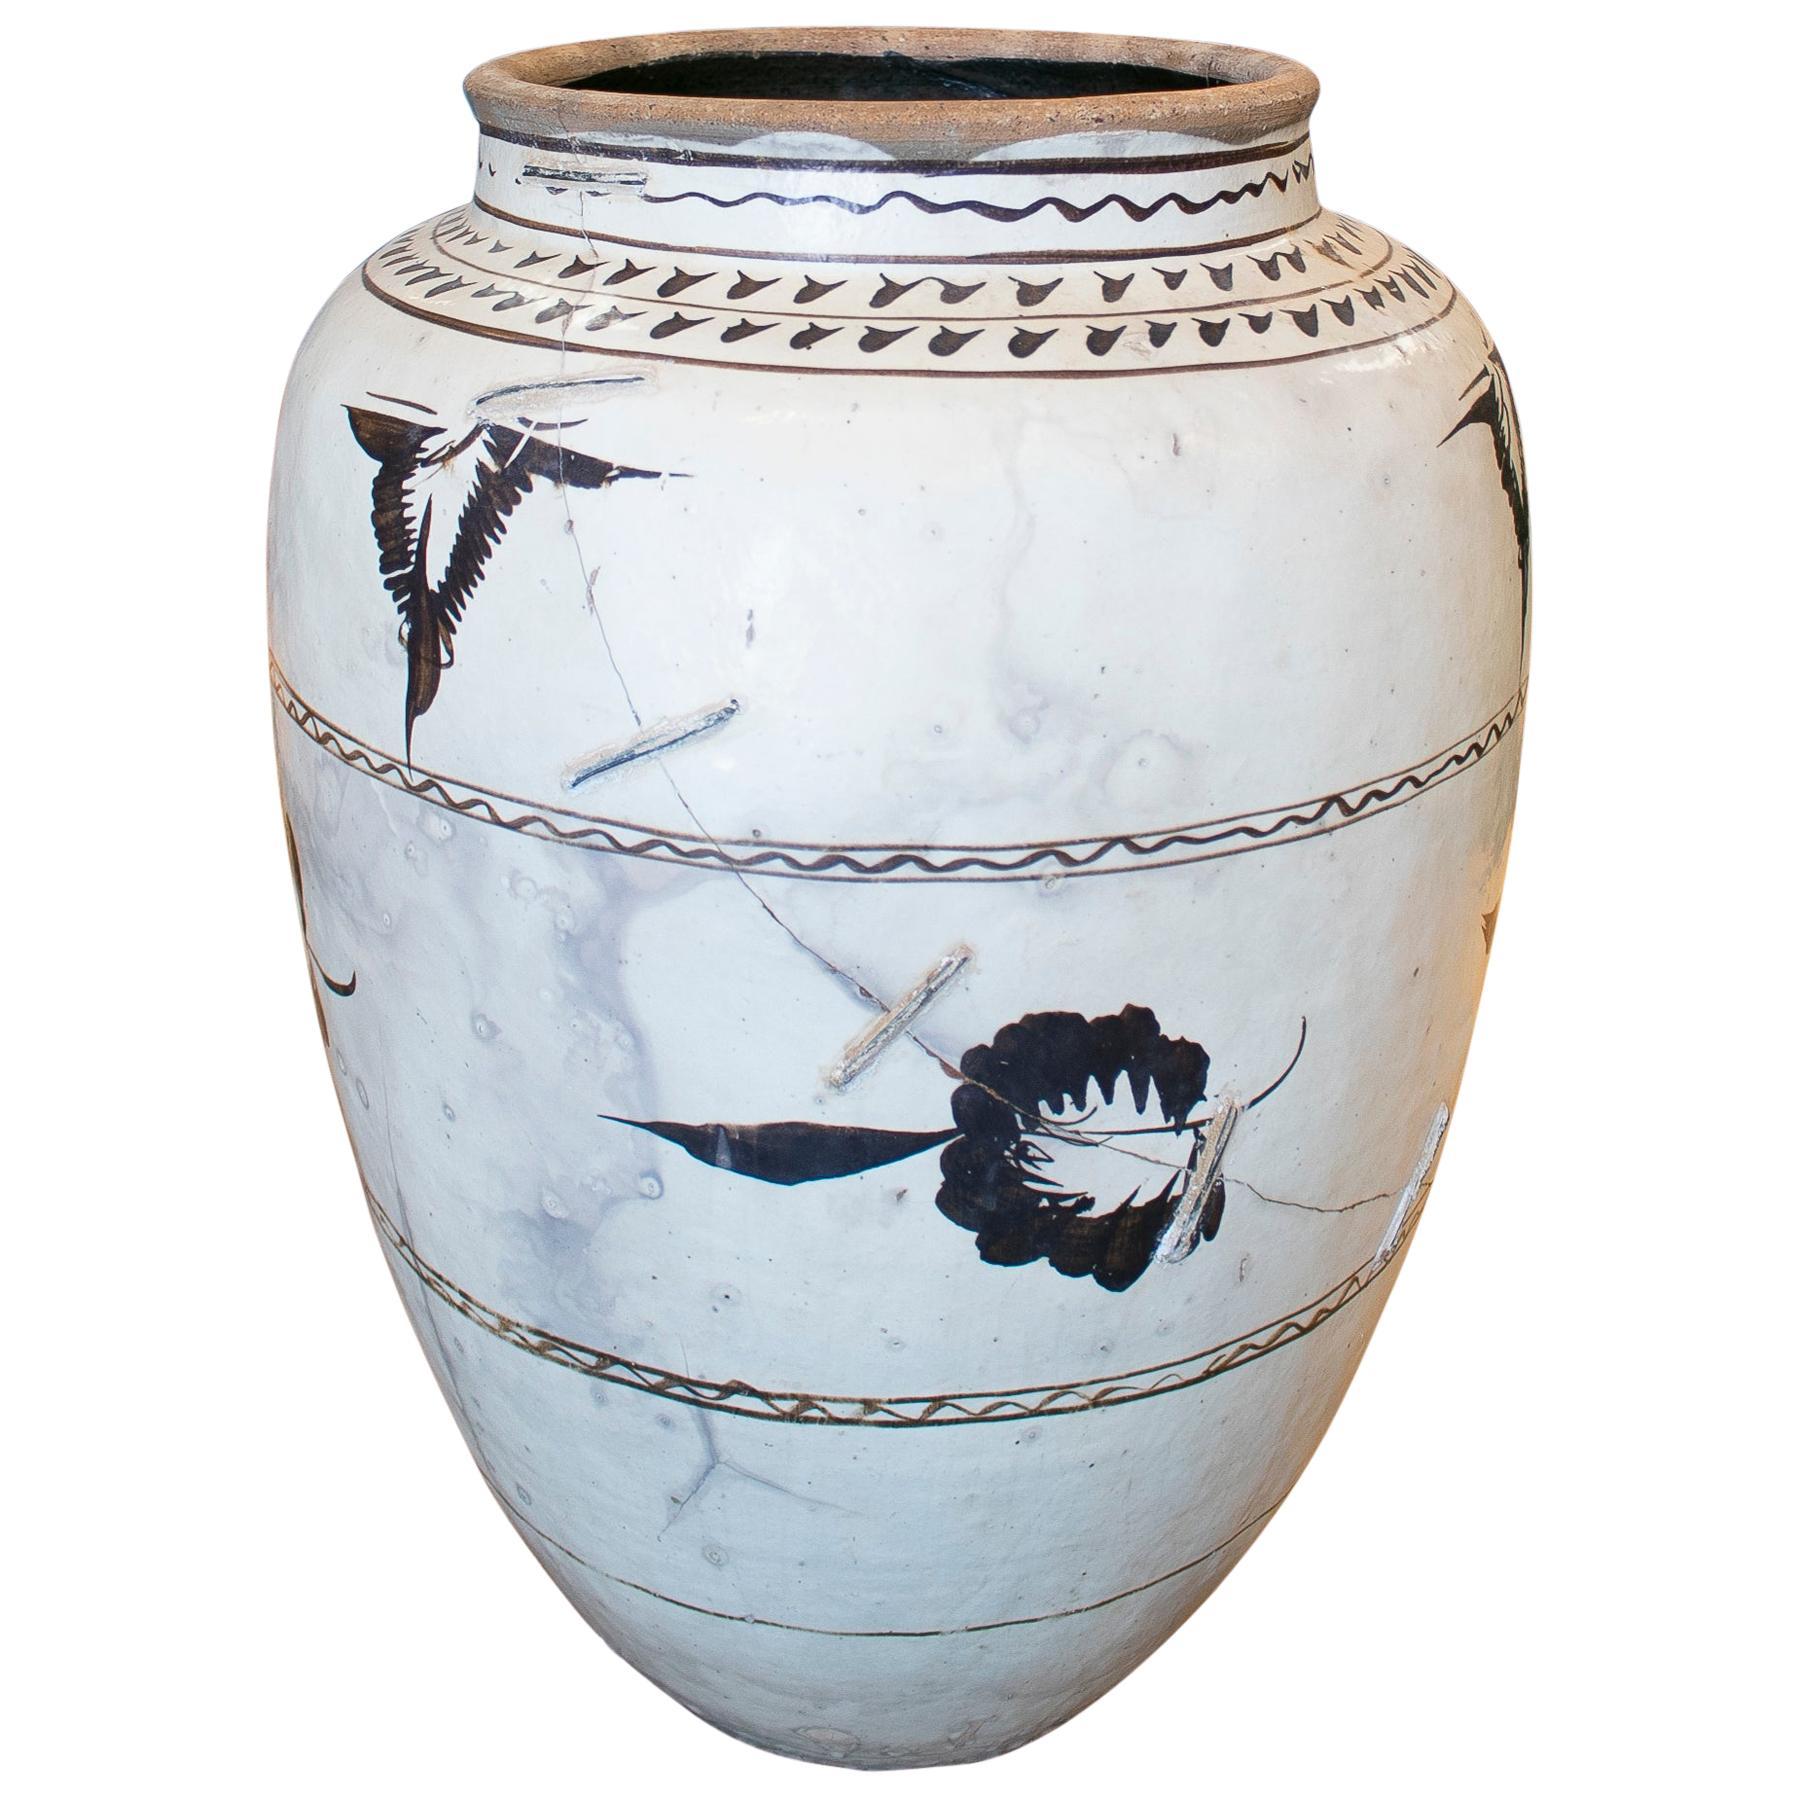 19th Century Chinese Hand Painted Glazed Ceramic Vase